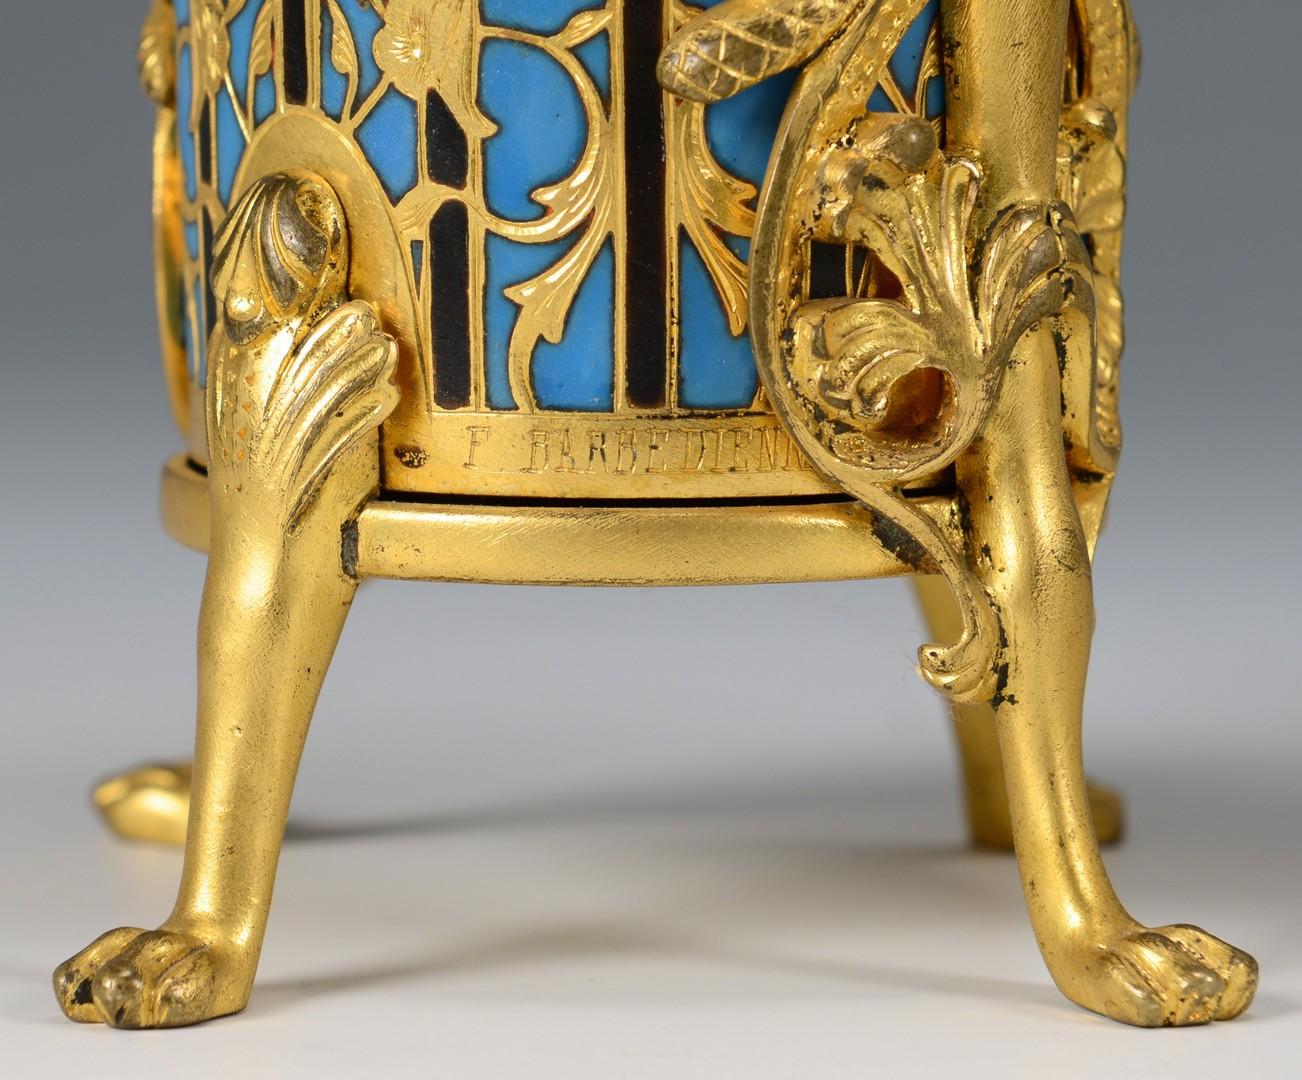 Lot 215: Pr. Barbedienne Foundry Enamel Vases